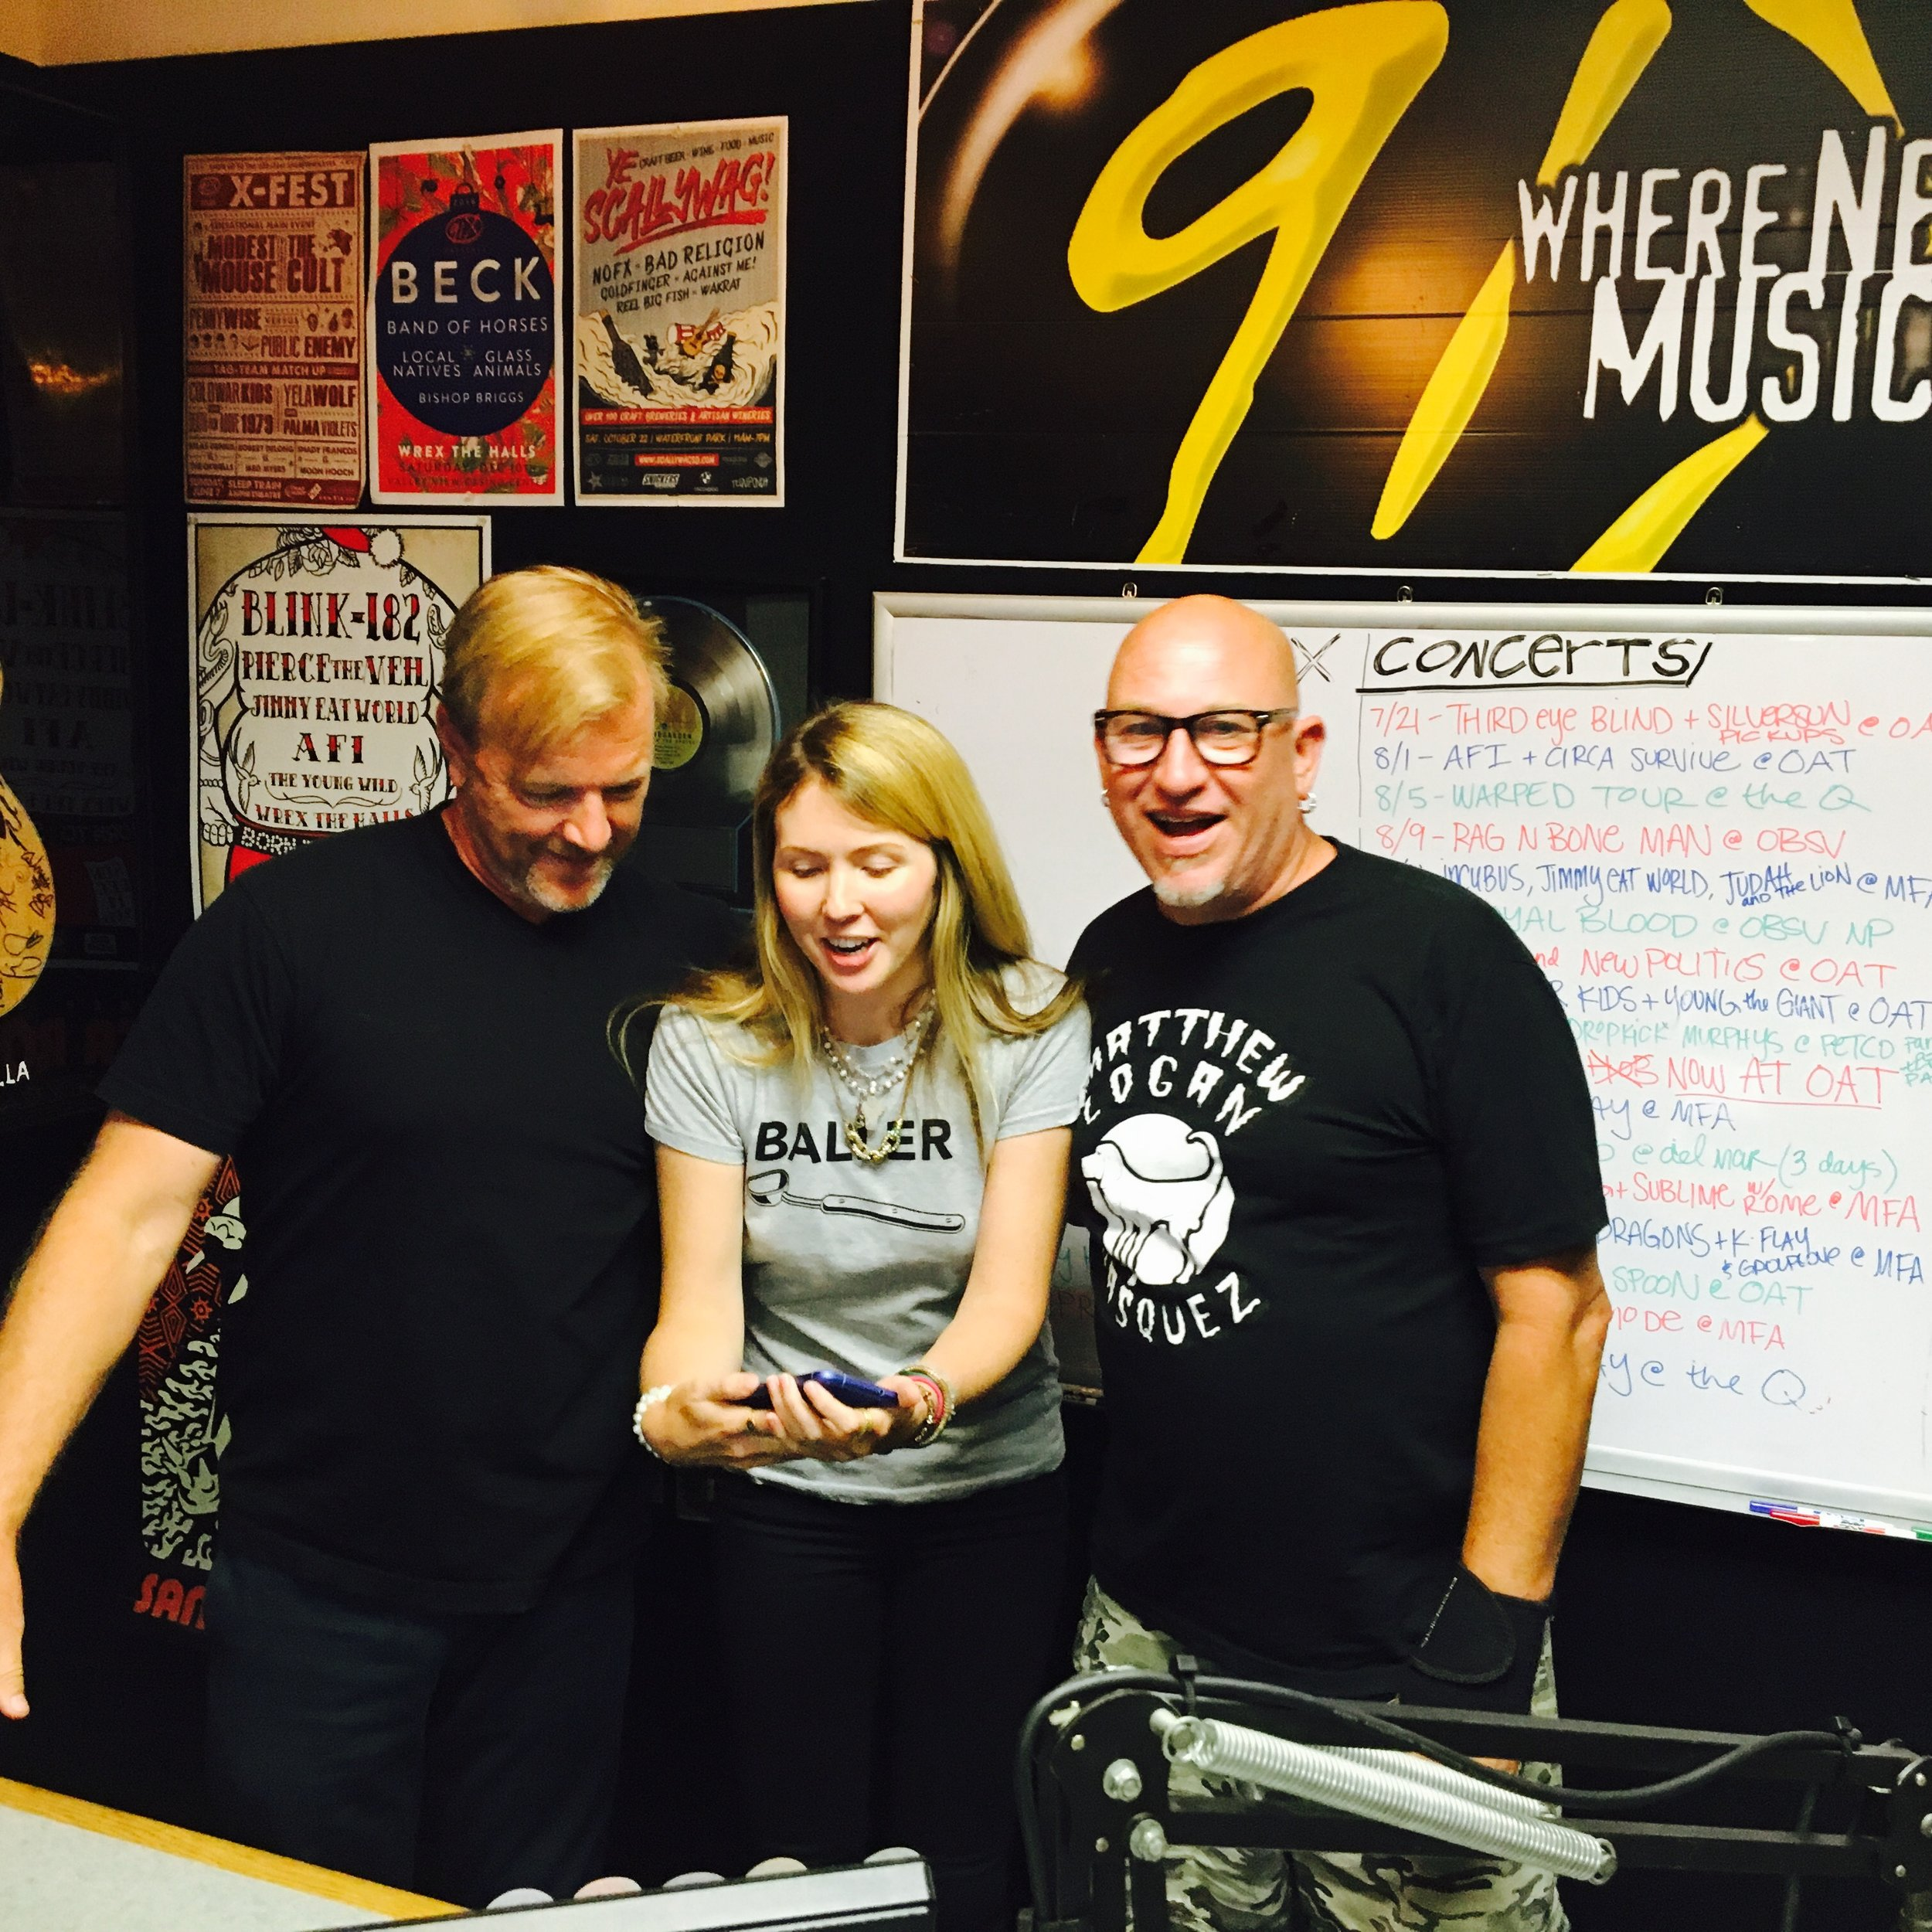 Beatie Wolfe + Tim Pyles + Lu Niles on 91x Radio